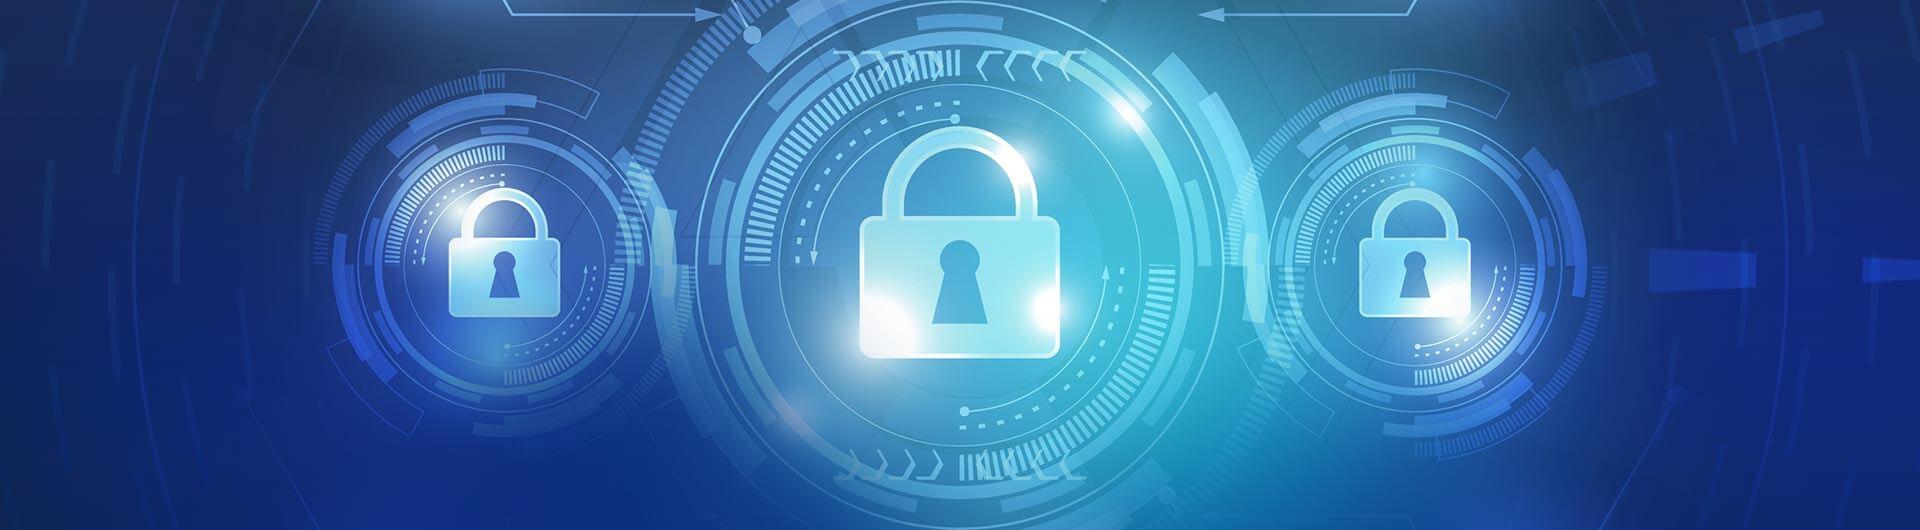 Tata Intra Privacy Policy